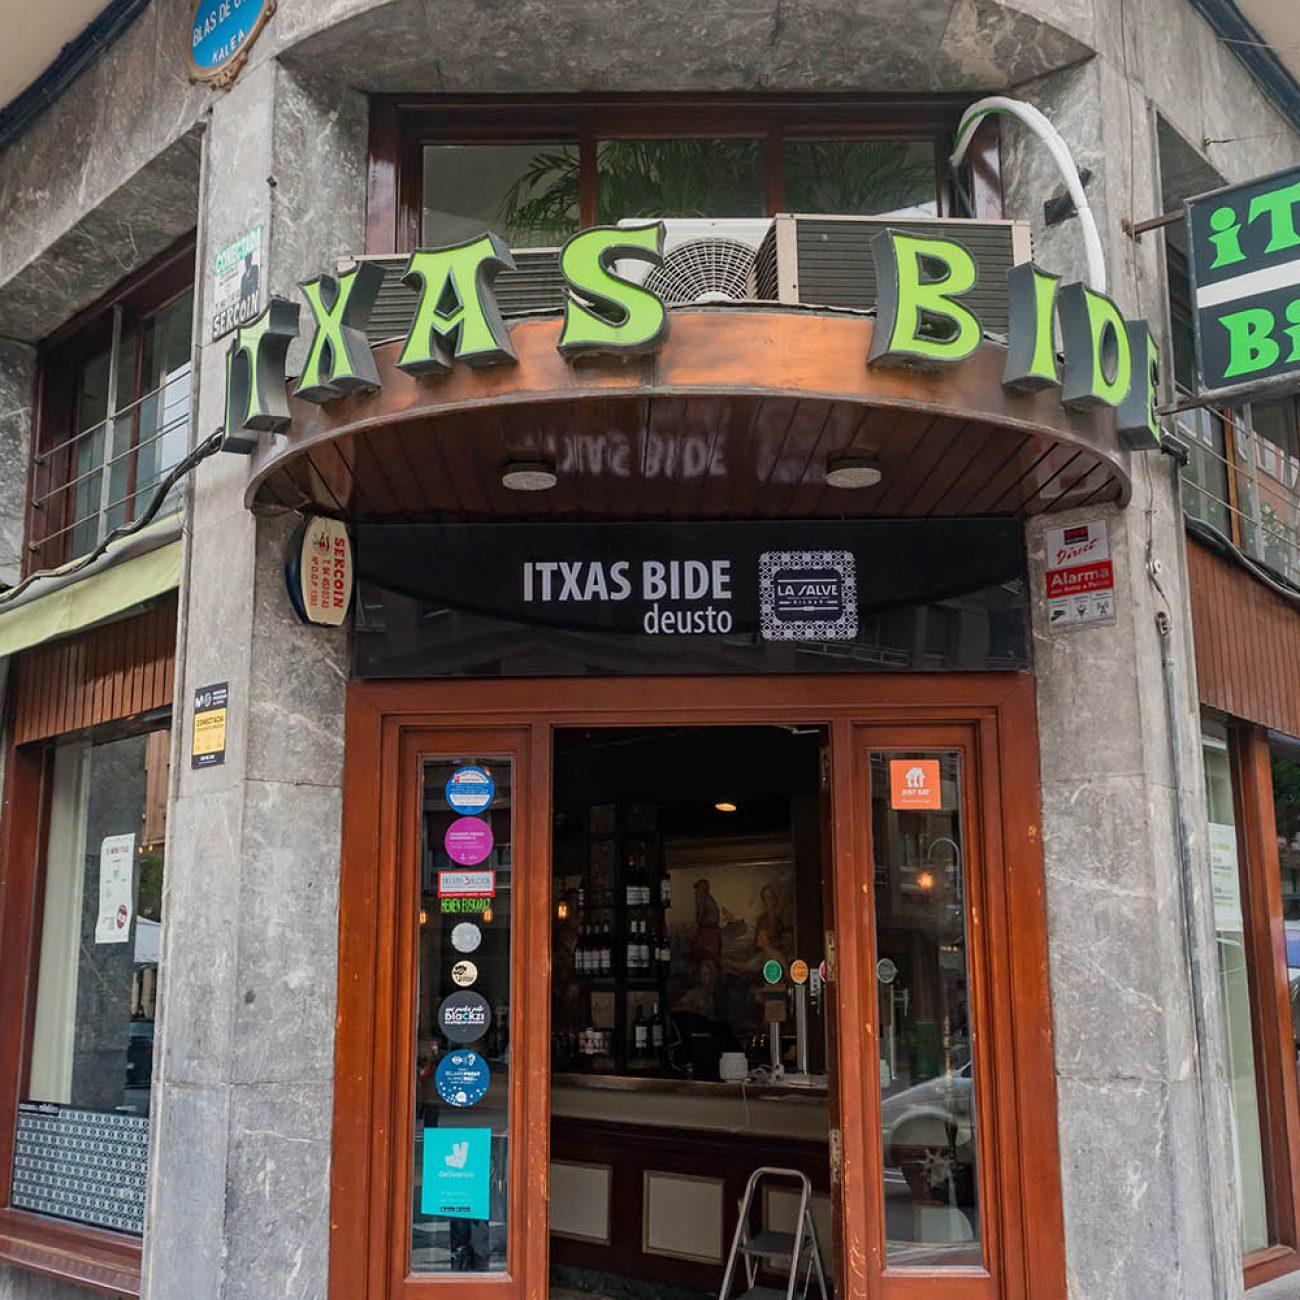 ITXAS-BIDE EN DEUSTO